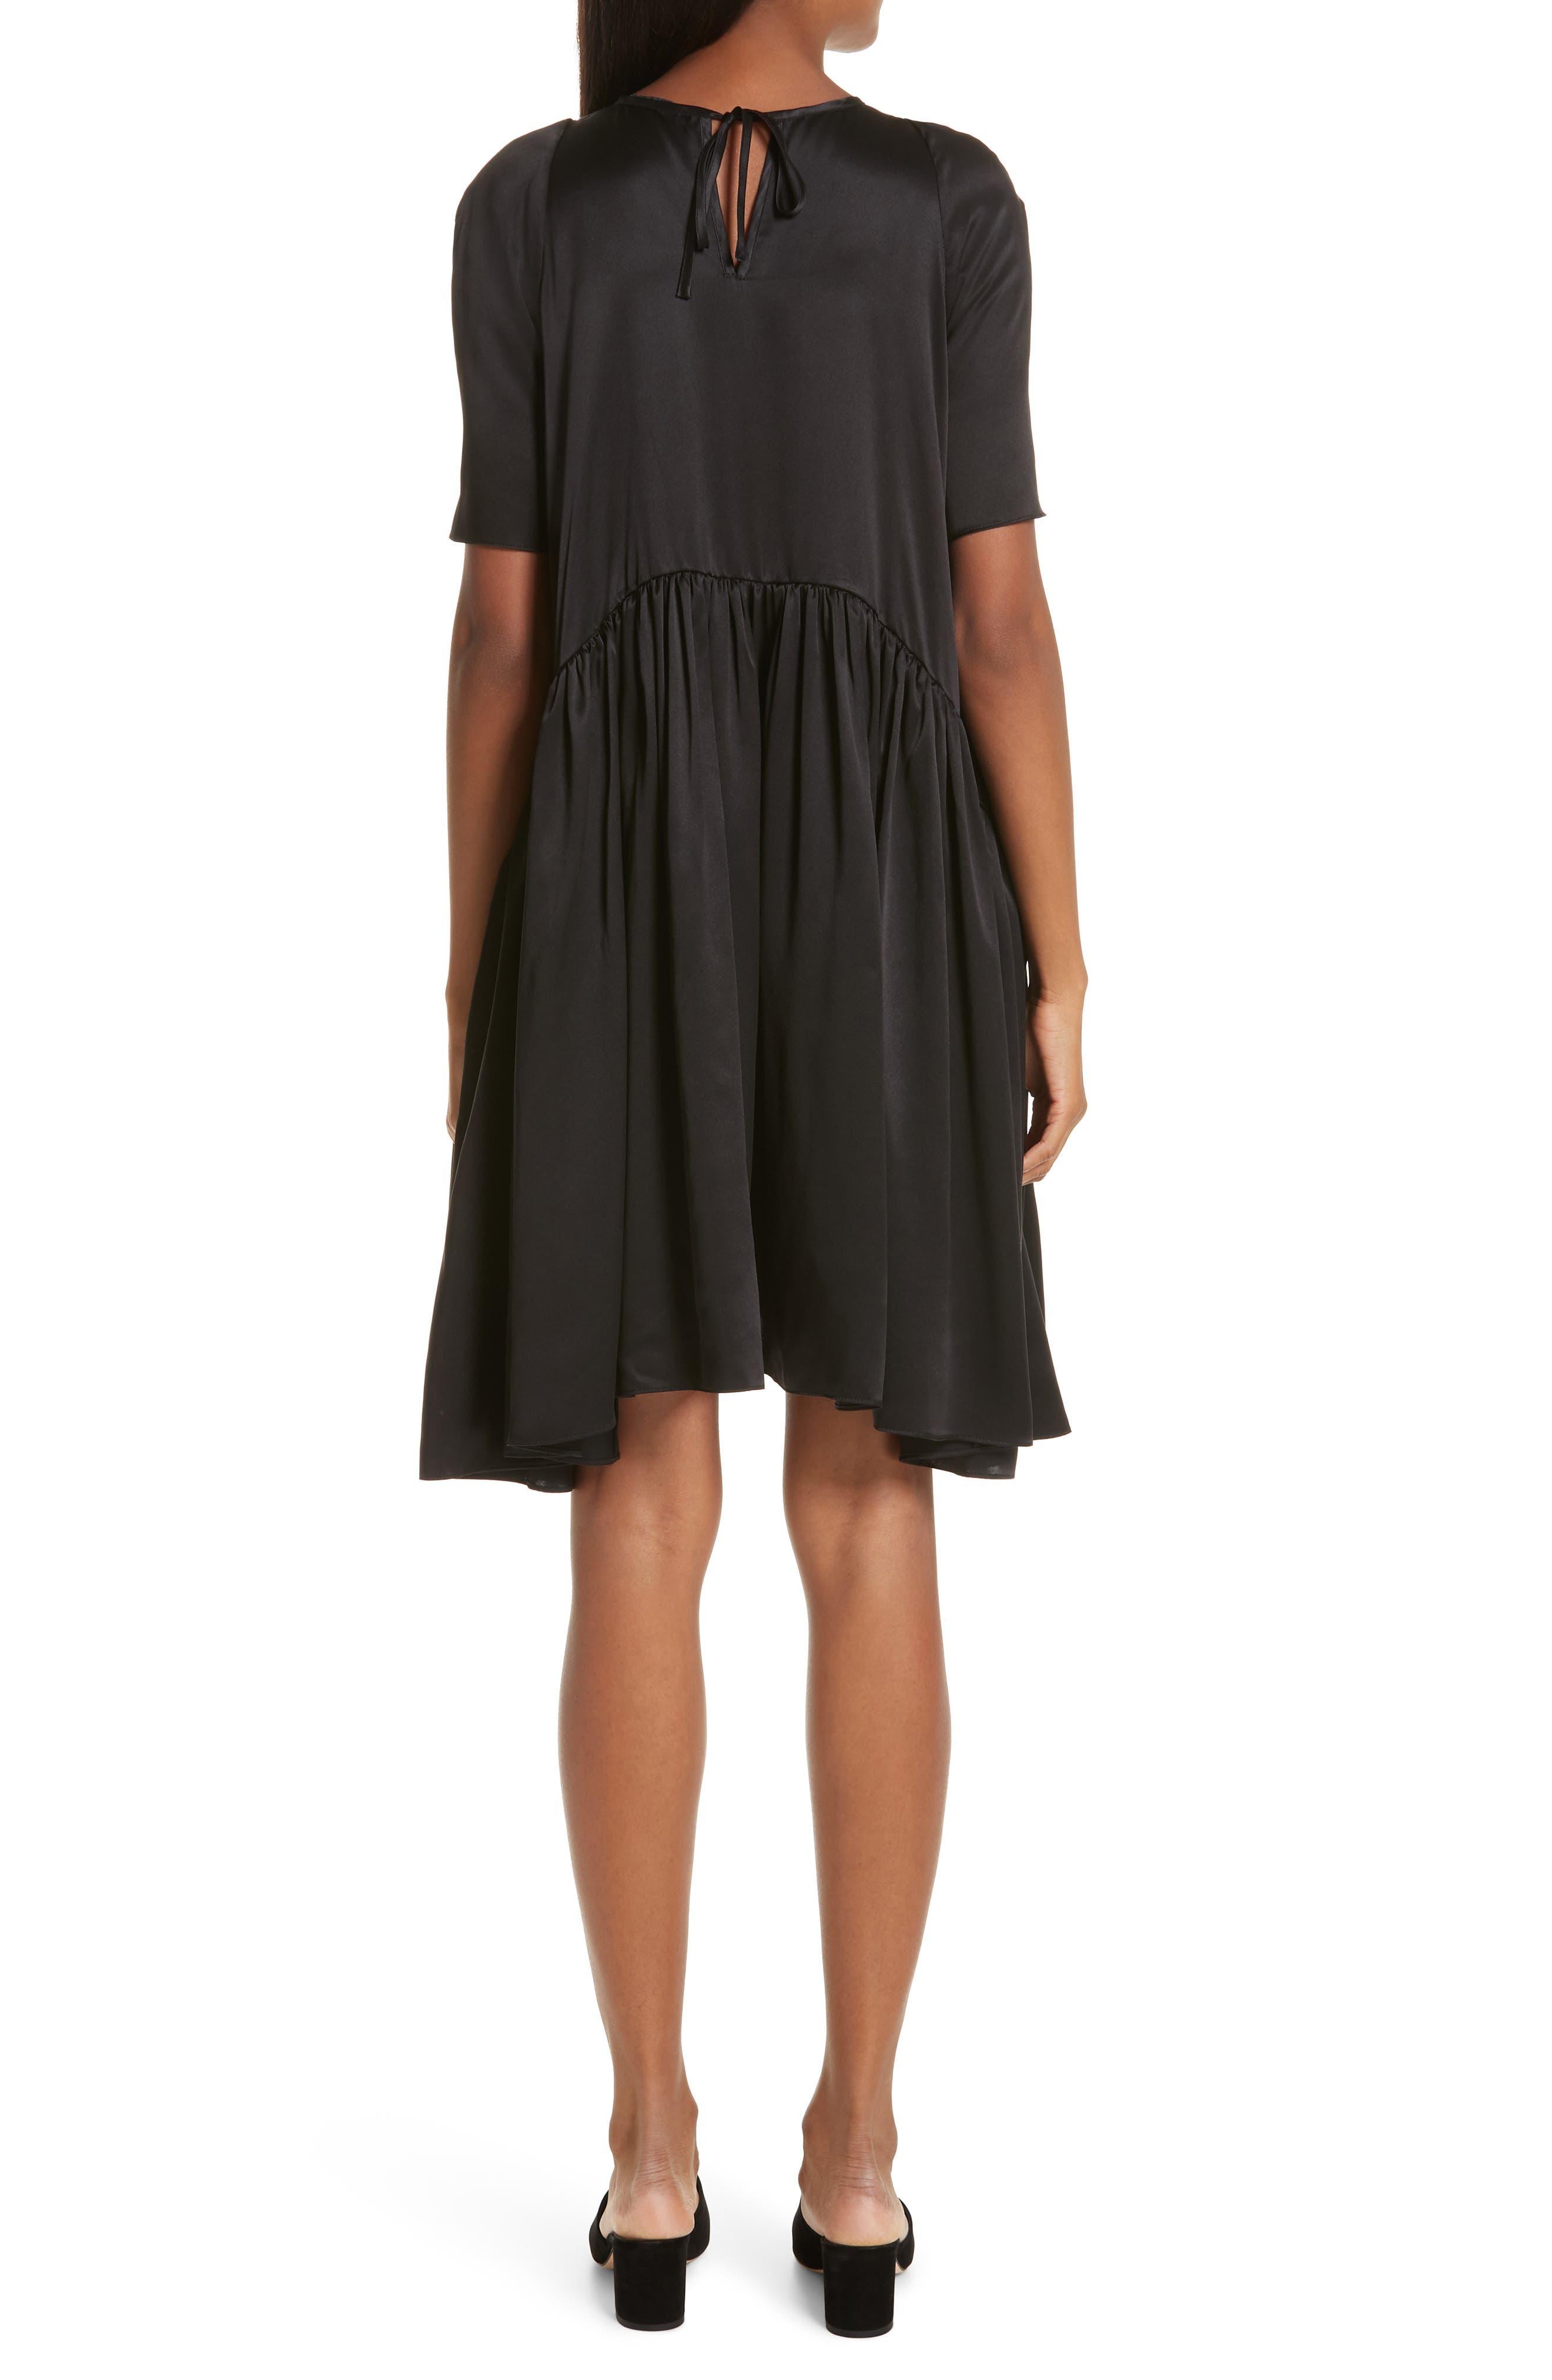 CECILIE BAHNSEN Annabella Dress in Black